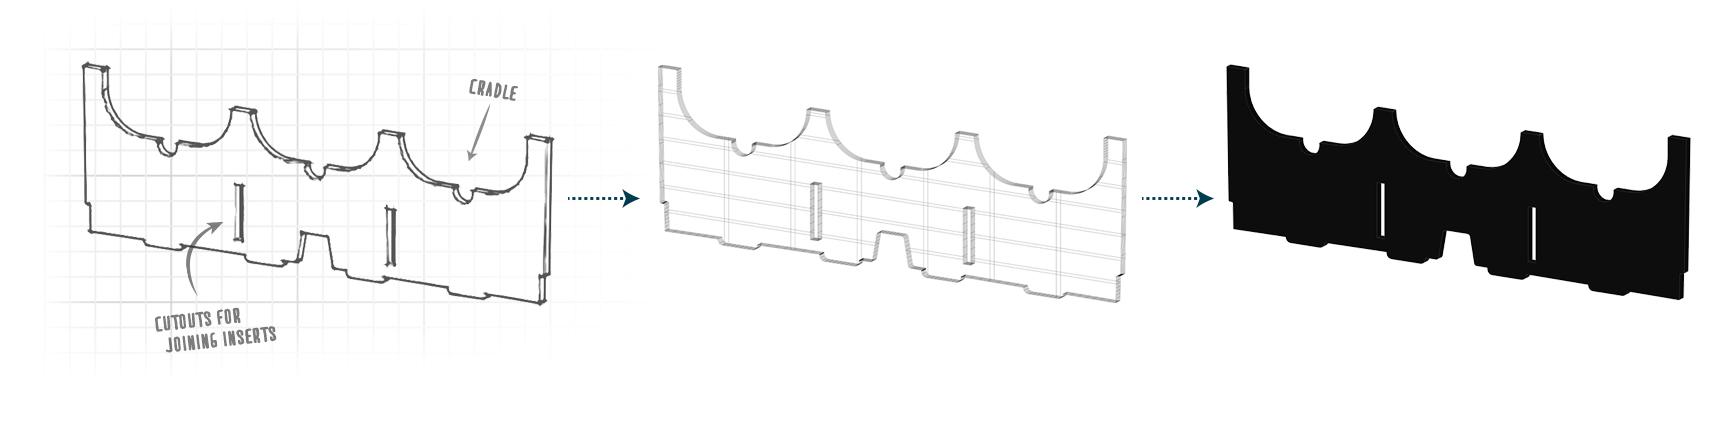 custominserts-sketchtorender1